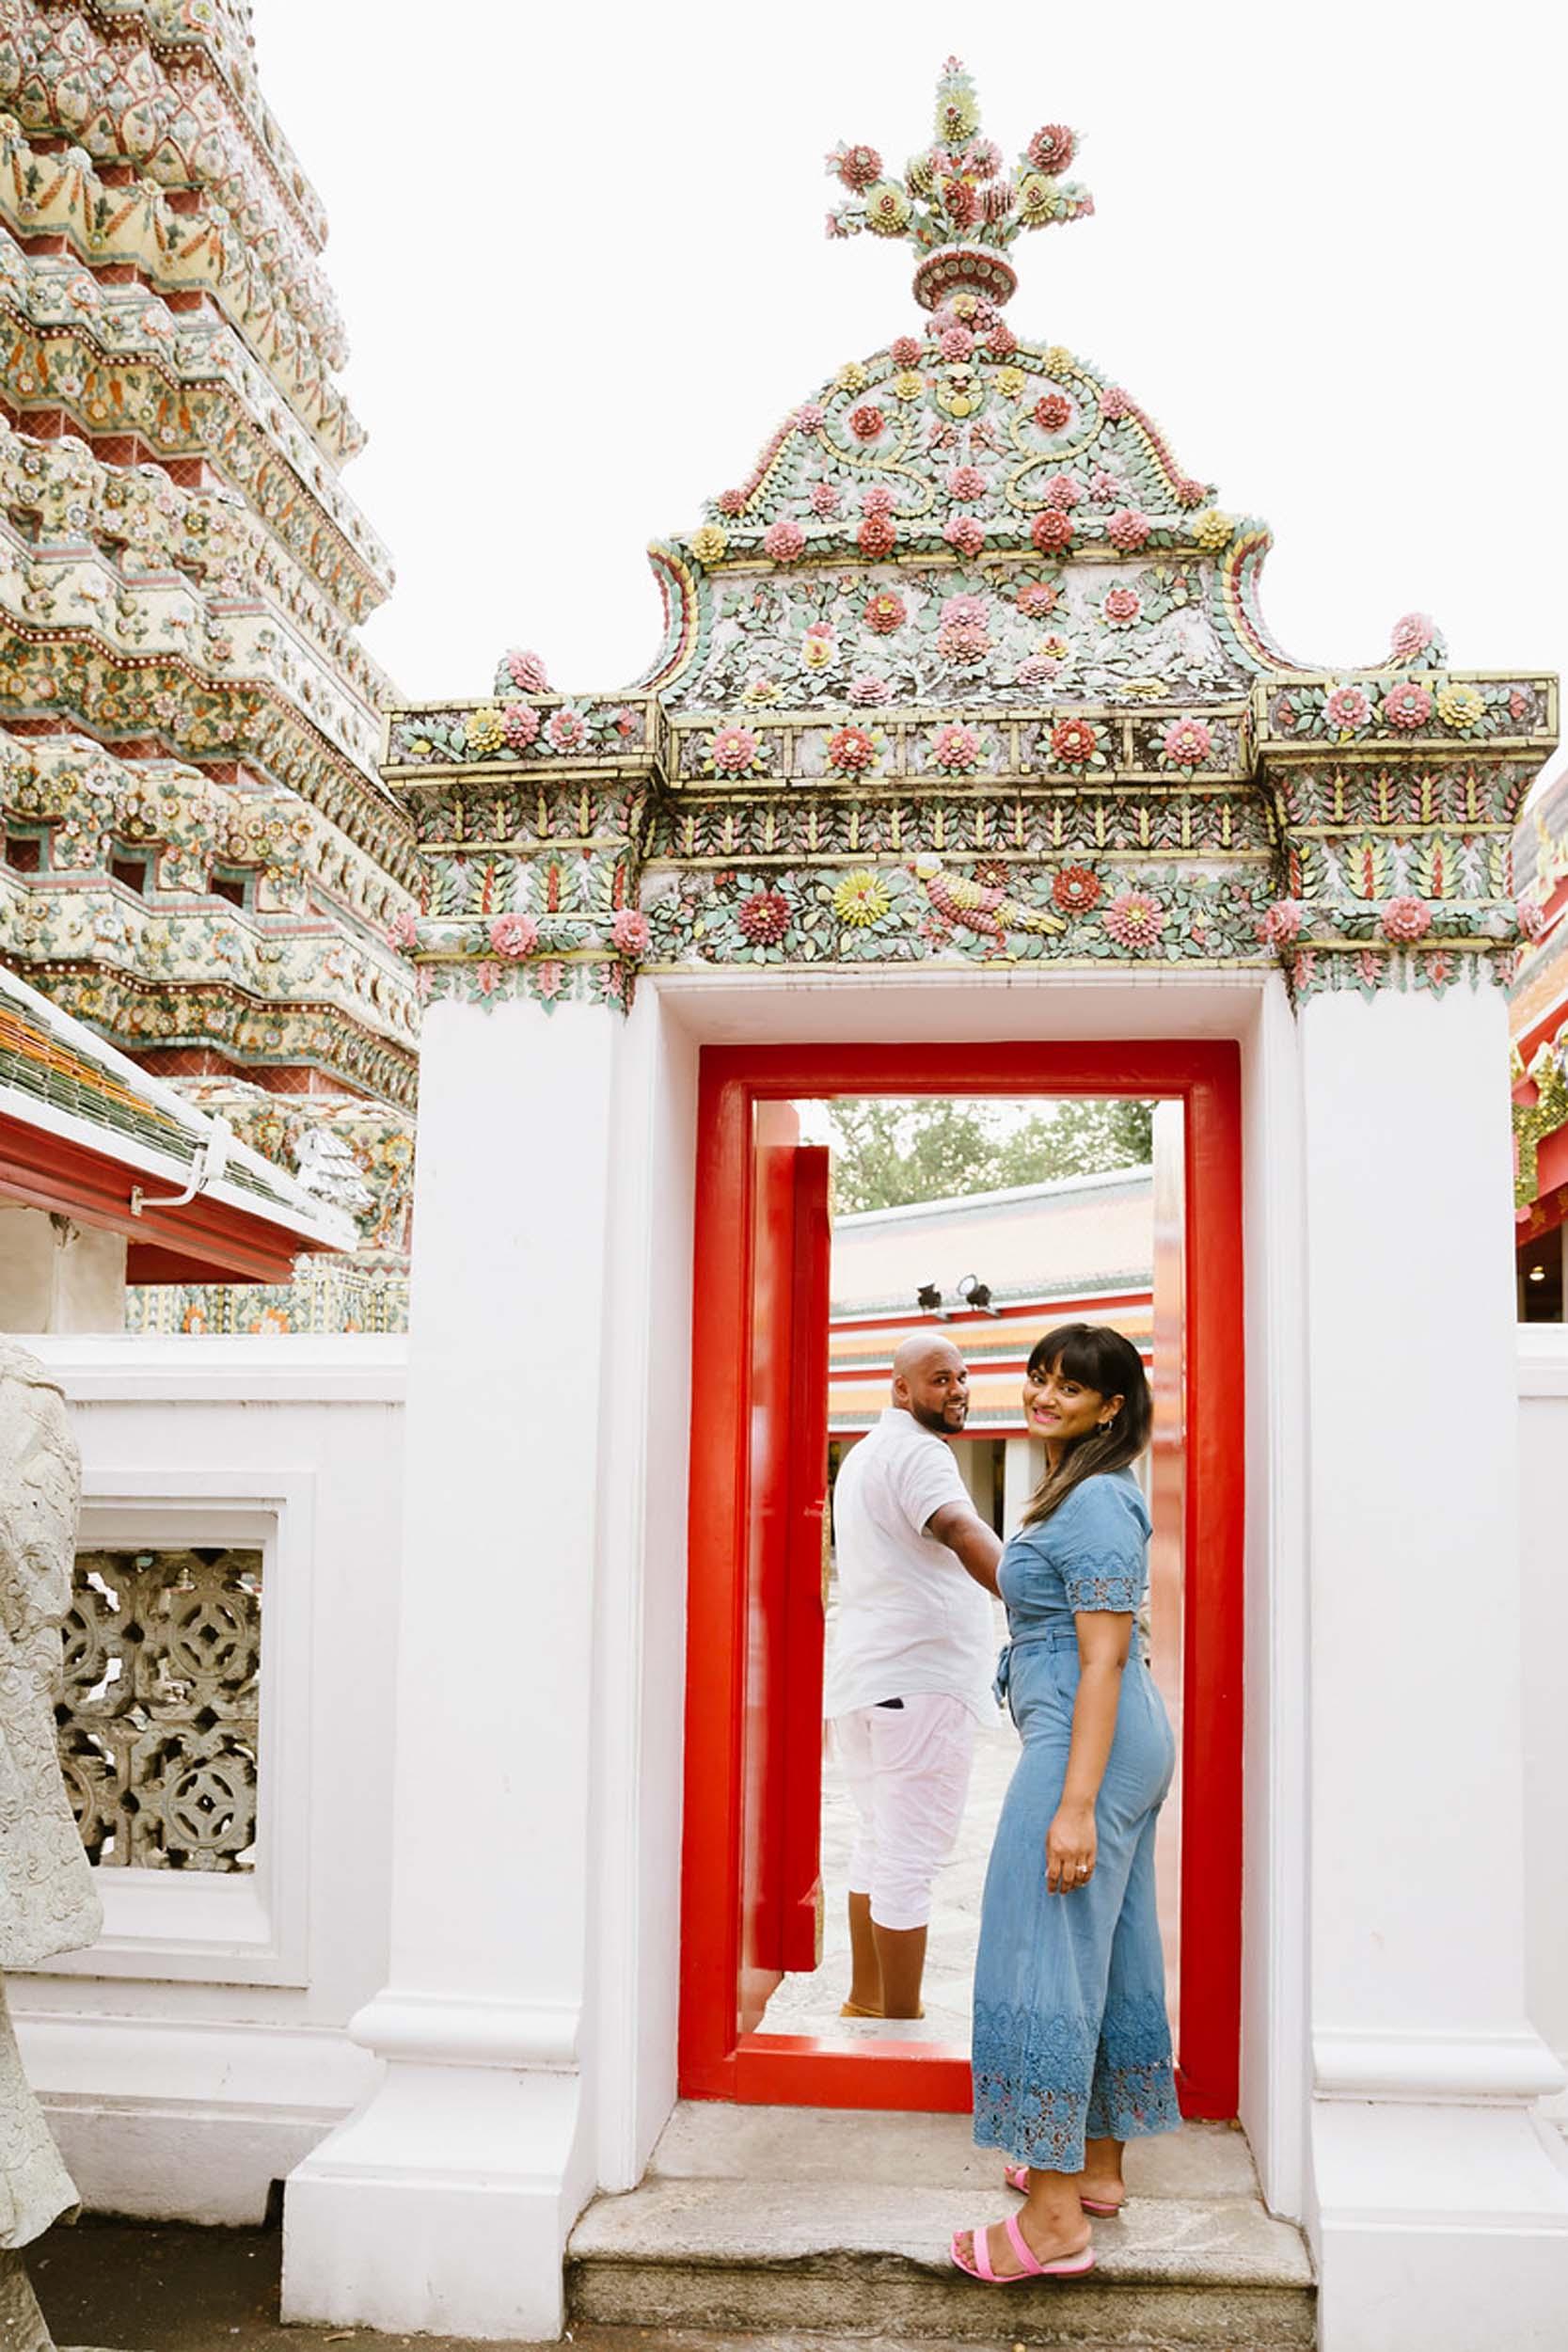 Flytographer Natasha in Bangkok